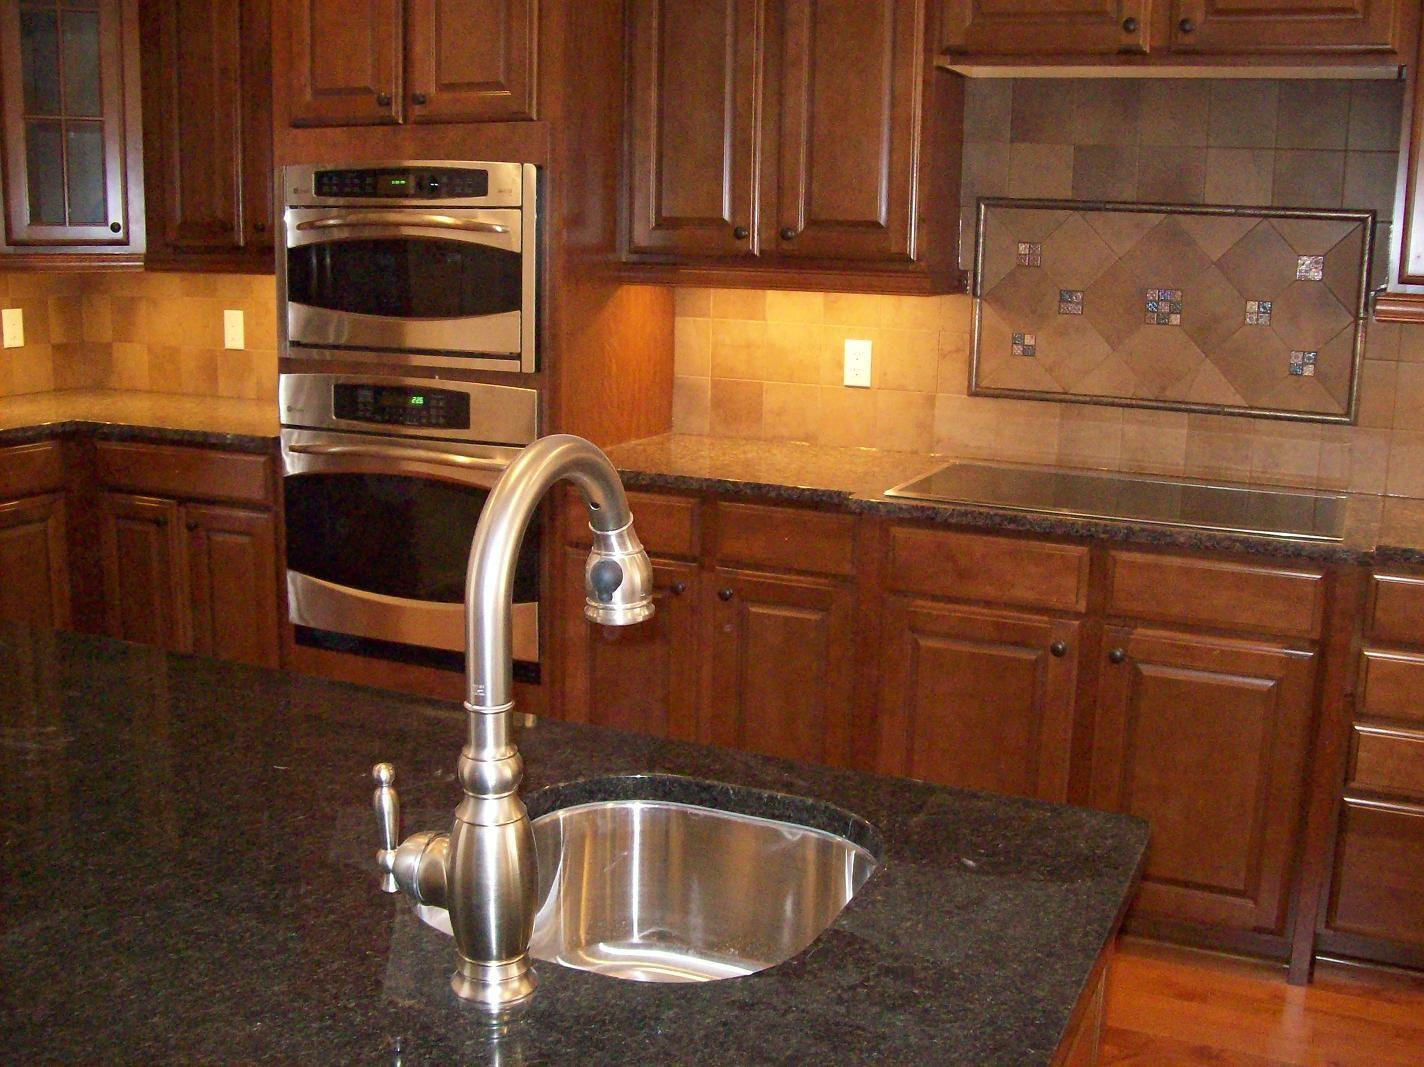 inexpensive backsplashes for kitchens kitchen games cooking 10 simple backsplash ideas your